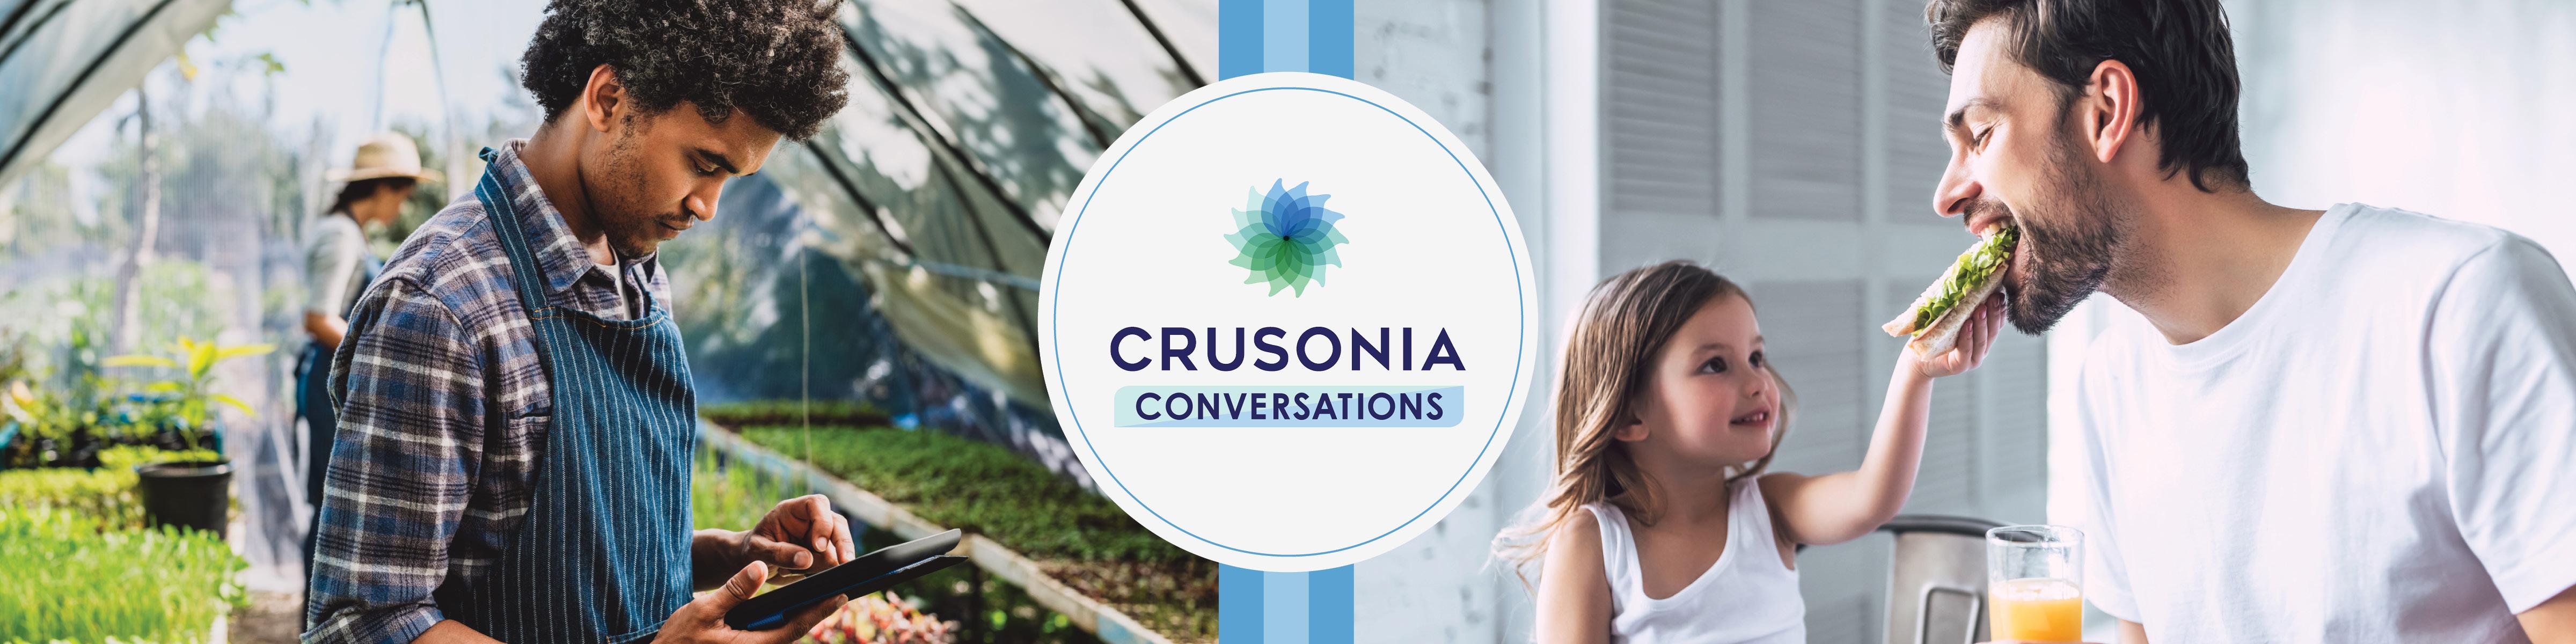 Crusonia-Conversations-Email-Banner